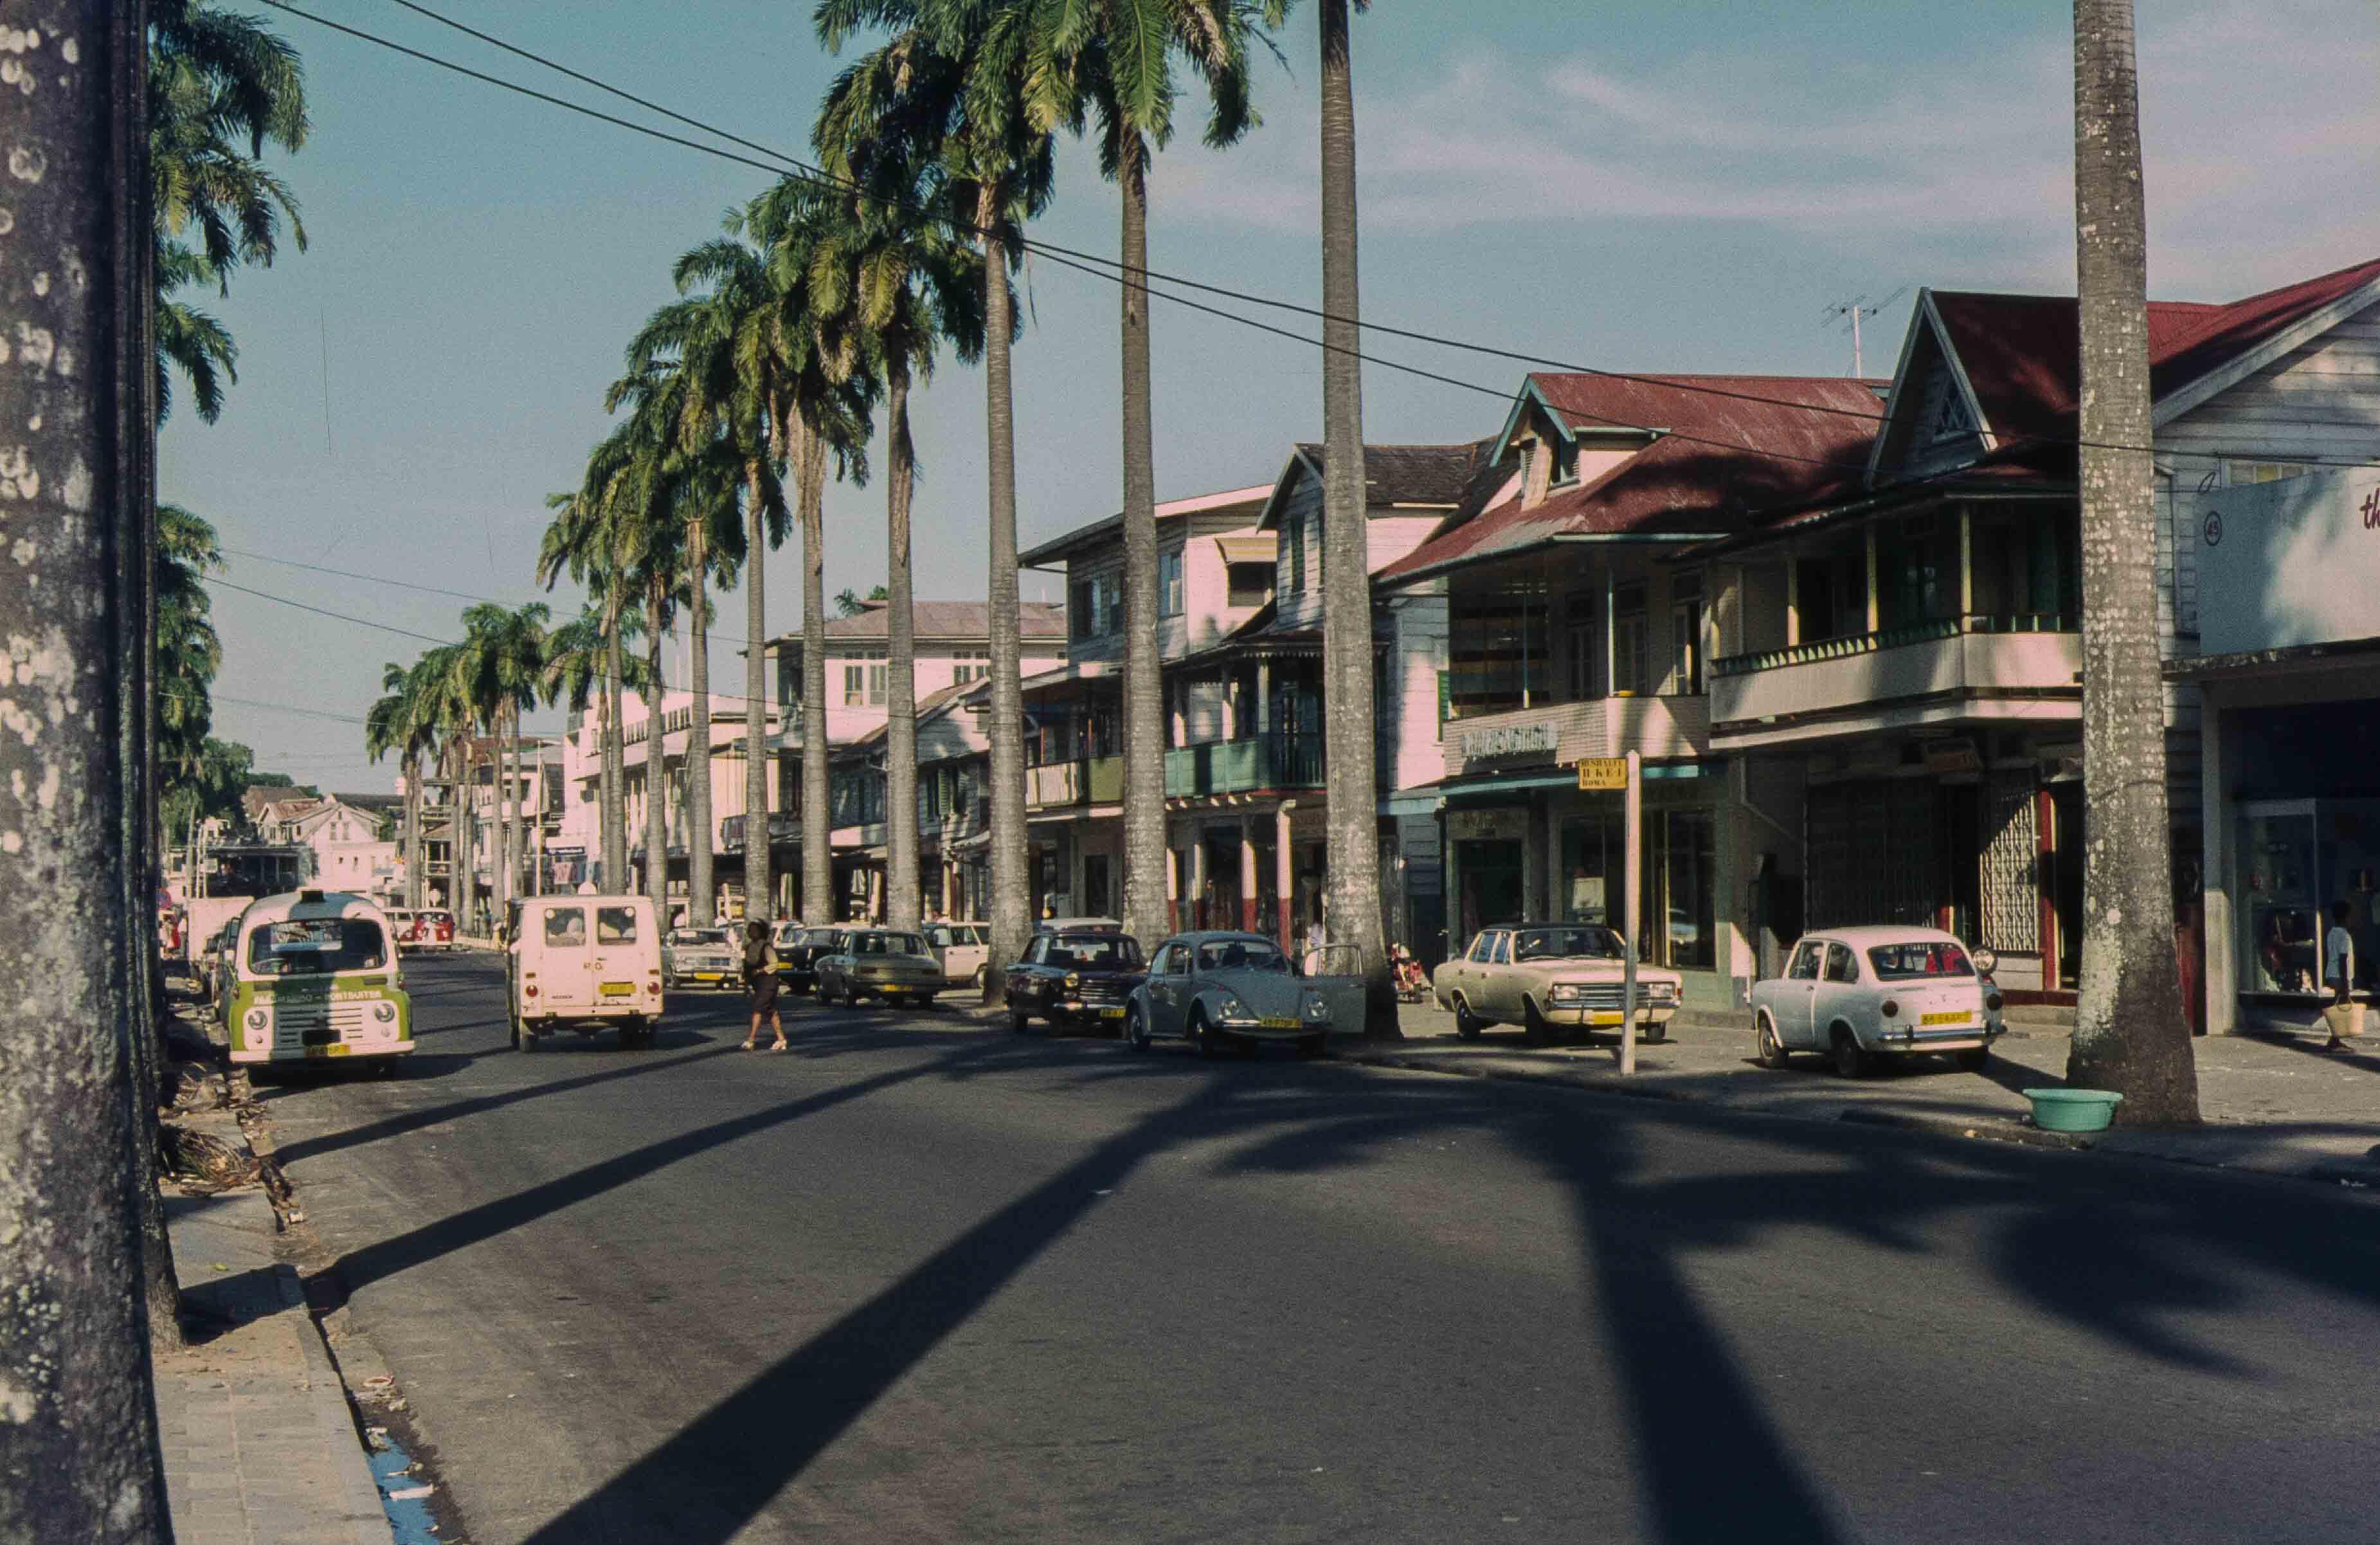 156. Suriname